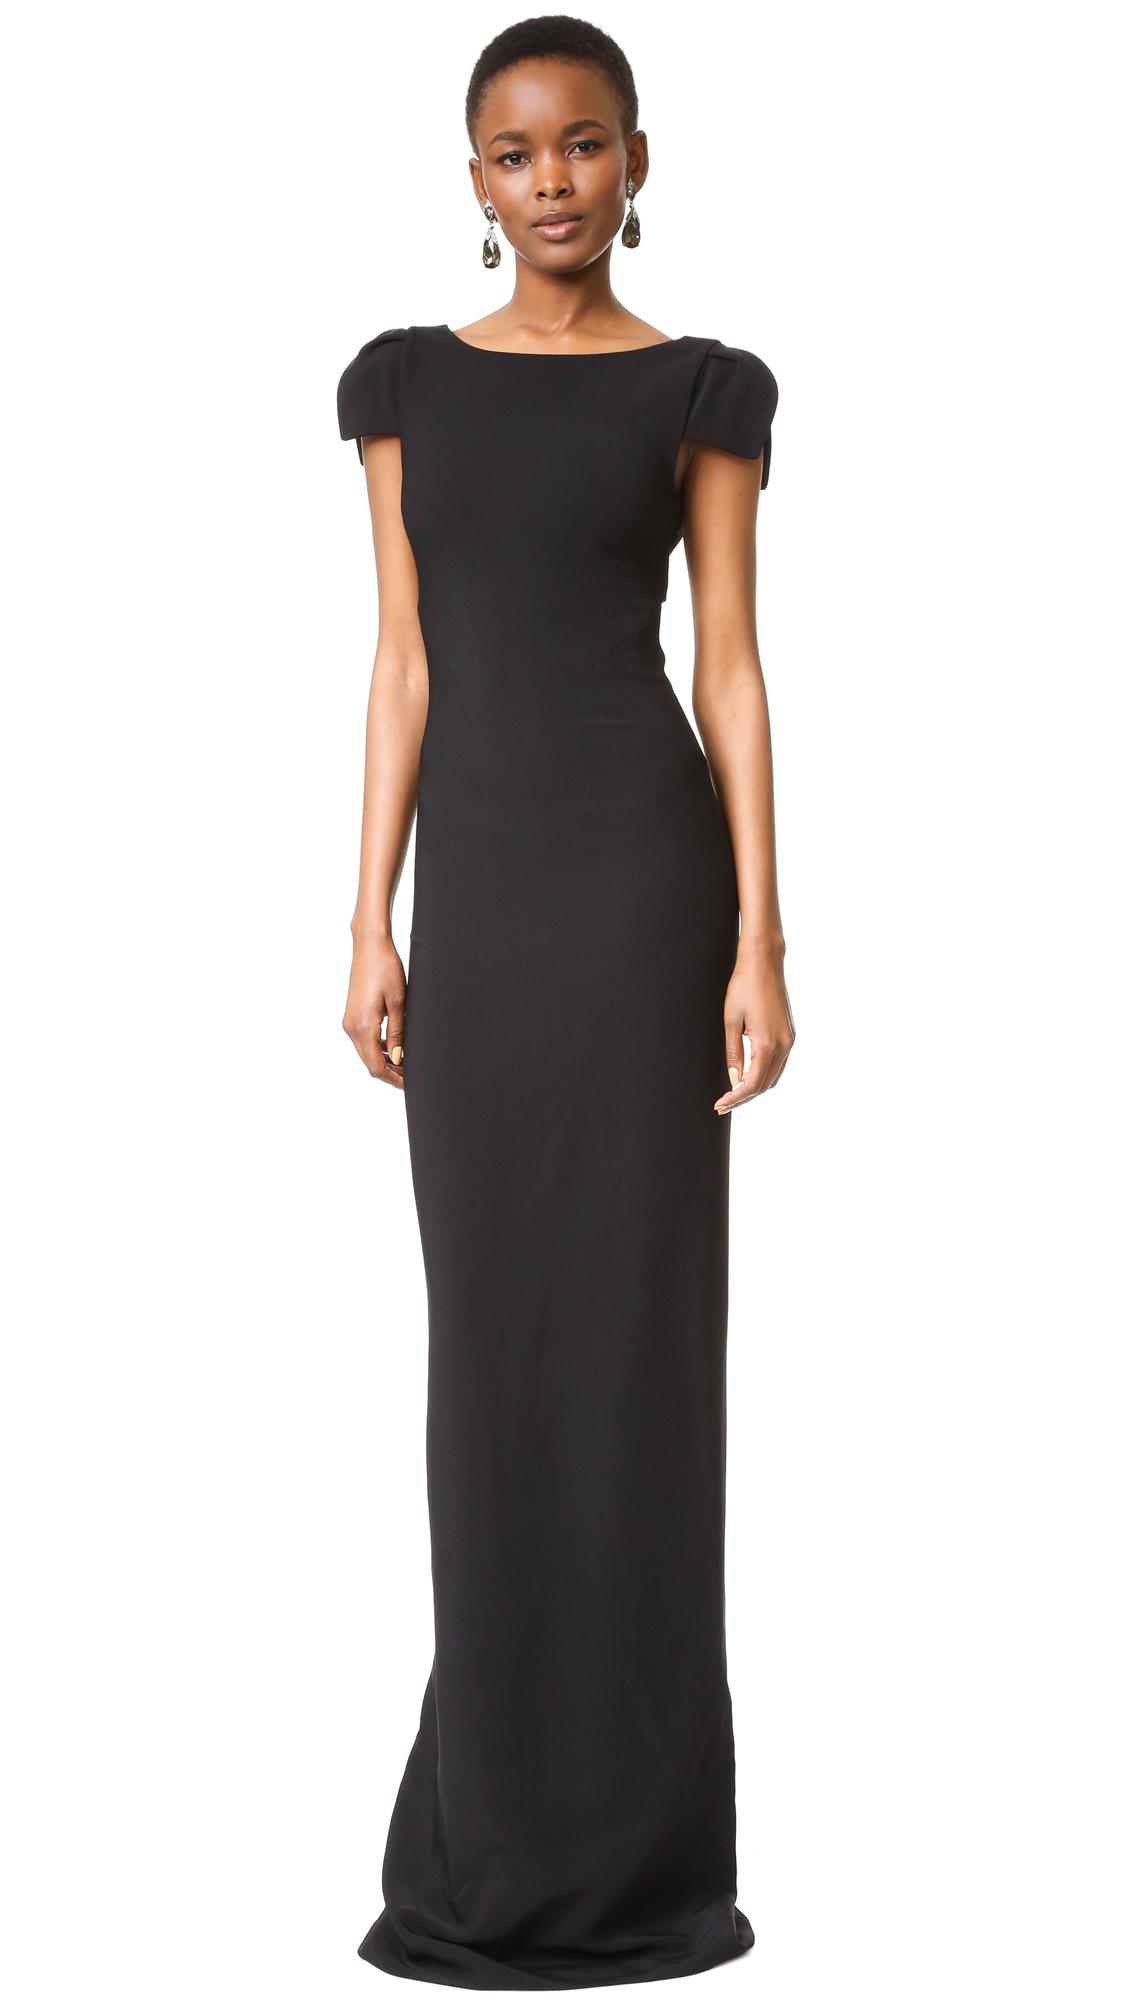 Antonio Berardi Gown - Black at Shopbop